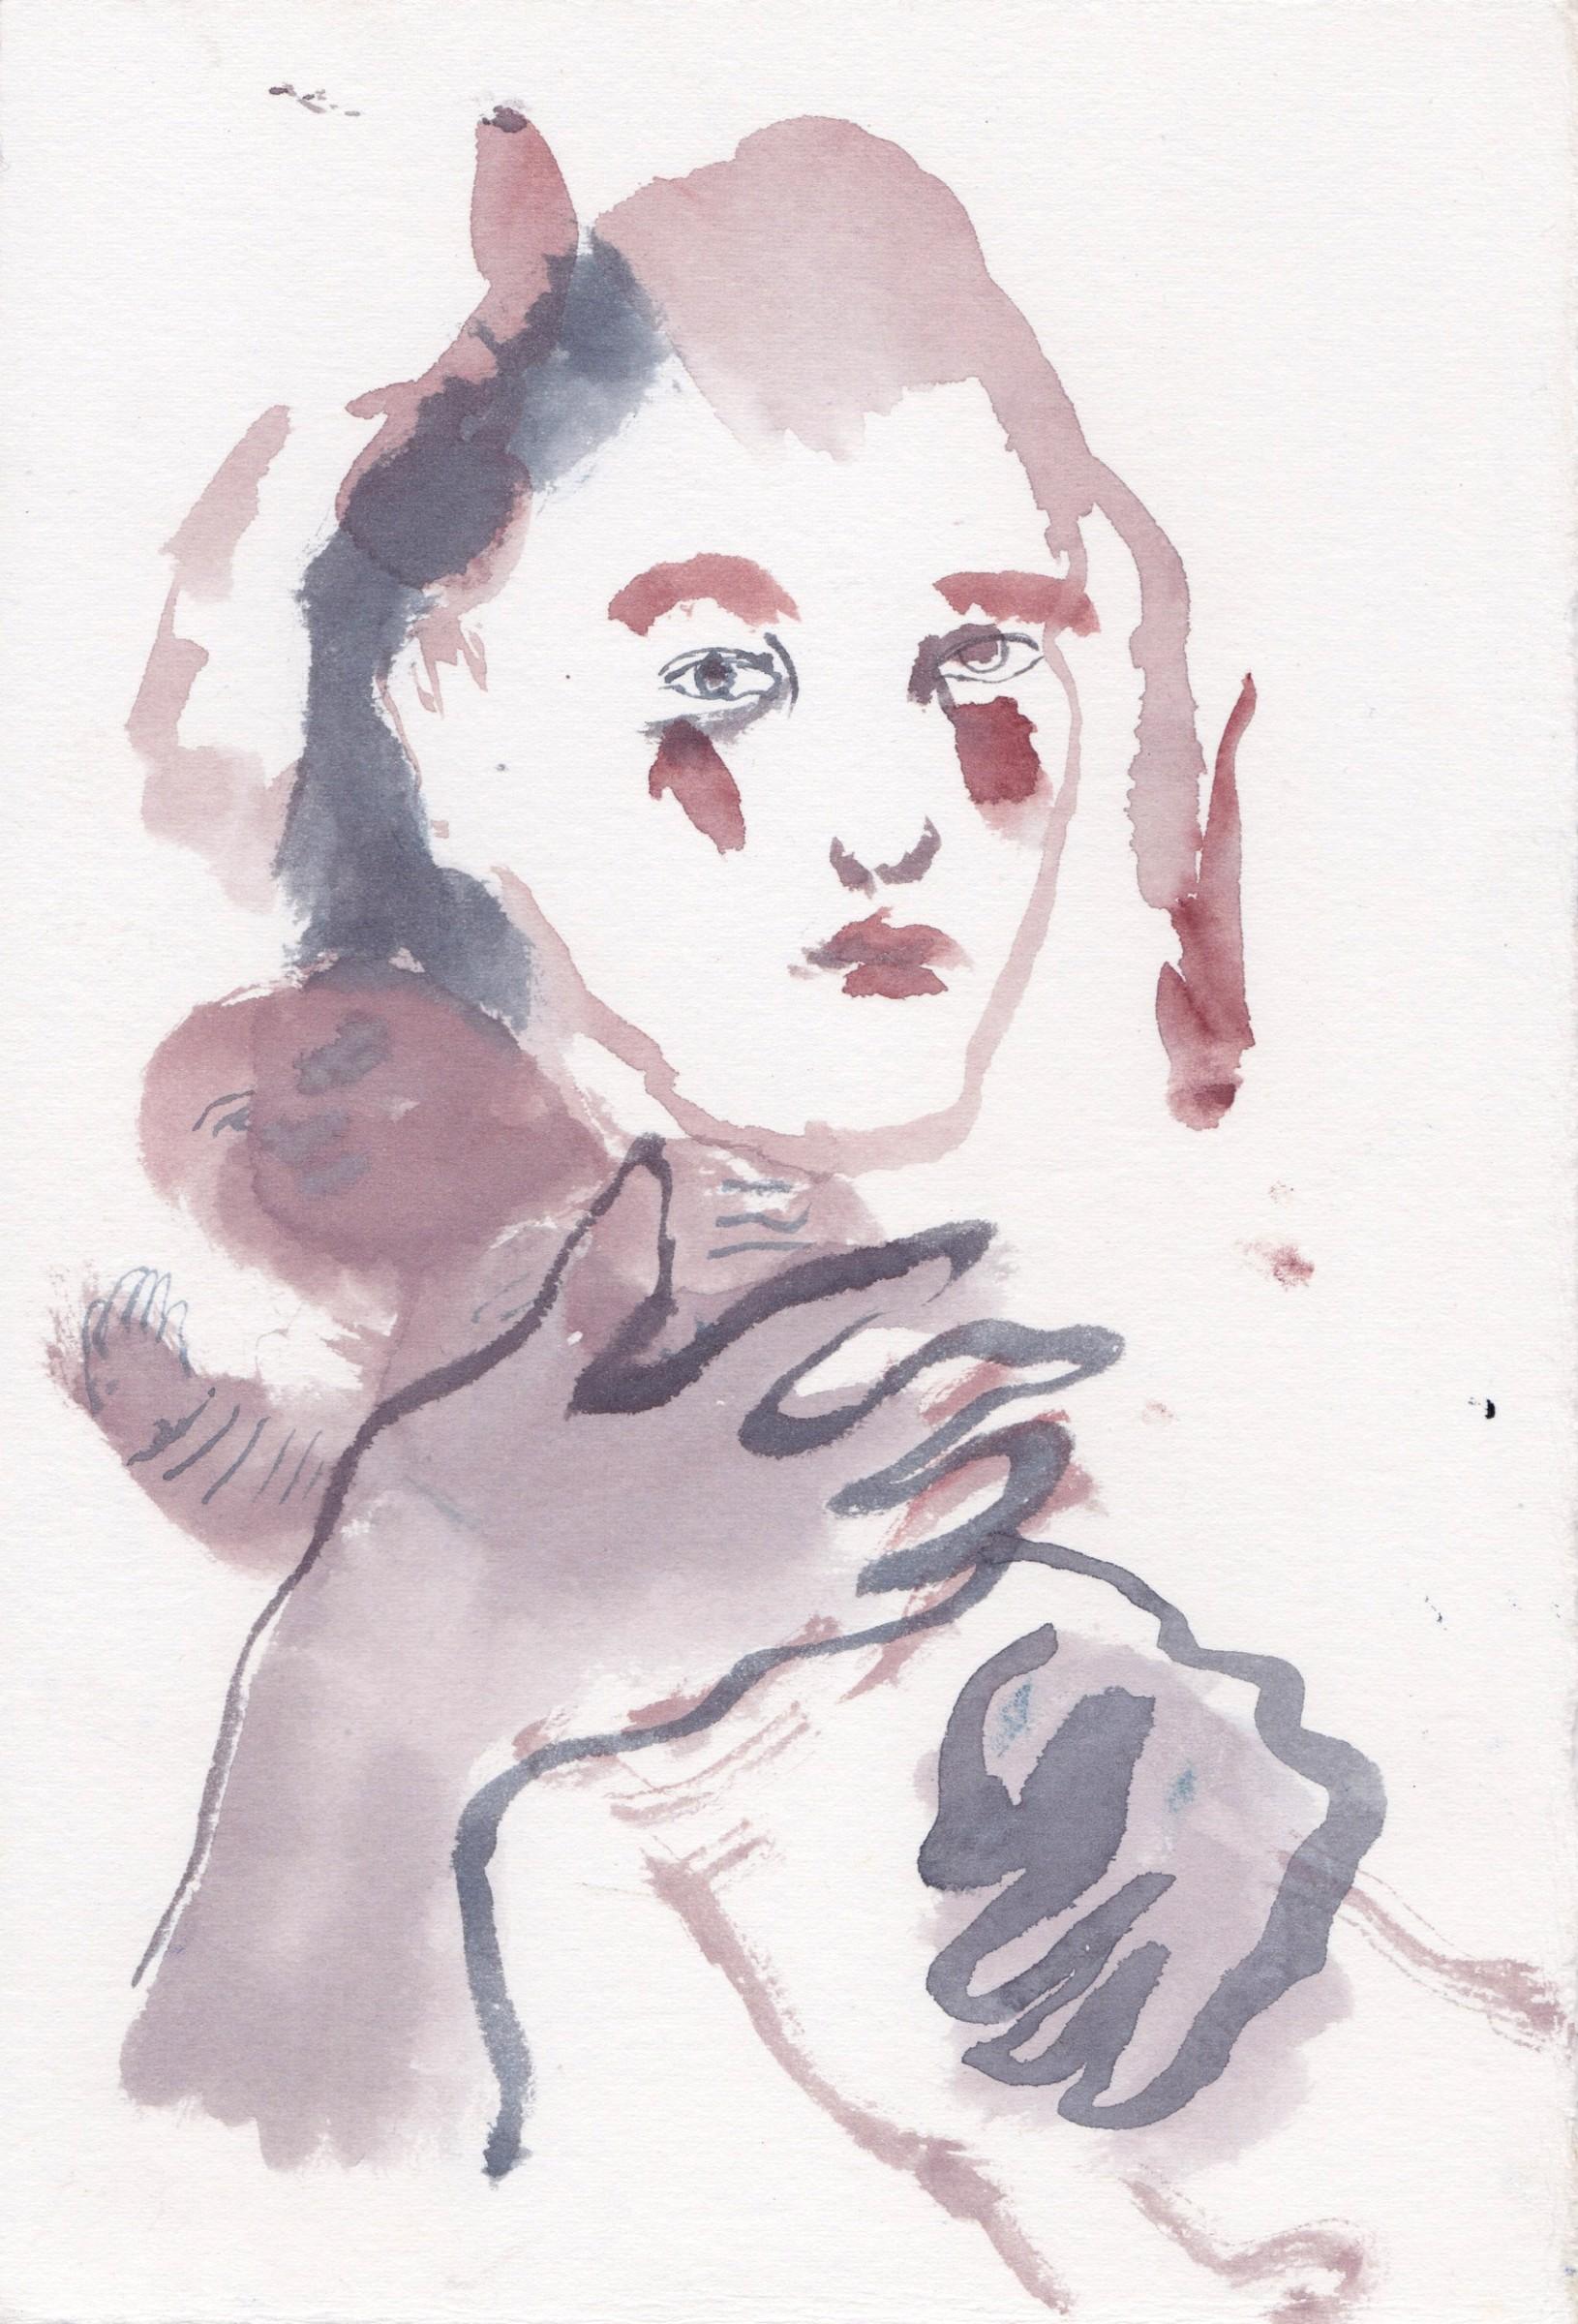 "<span class=""link fancybox-details-link""><a href=""/artists/394-jessica-jane-charleston/works/12215-jessica-jane-charleston-woman-son/"">View Detail Page</a></span><div class=""artist""><span class=""artist""><strong>Jessica Jane Charleston</strong></span></div><div class=""title""><em>Woman & Son</em></div><div class=""medium"">watercolour on paper</div><div class=""dimensions"">Frame: 33 x 23 cm<br /> Artwork: 28 x 19 cm</div><div class=""price"">£500.00</div>"